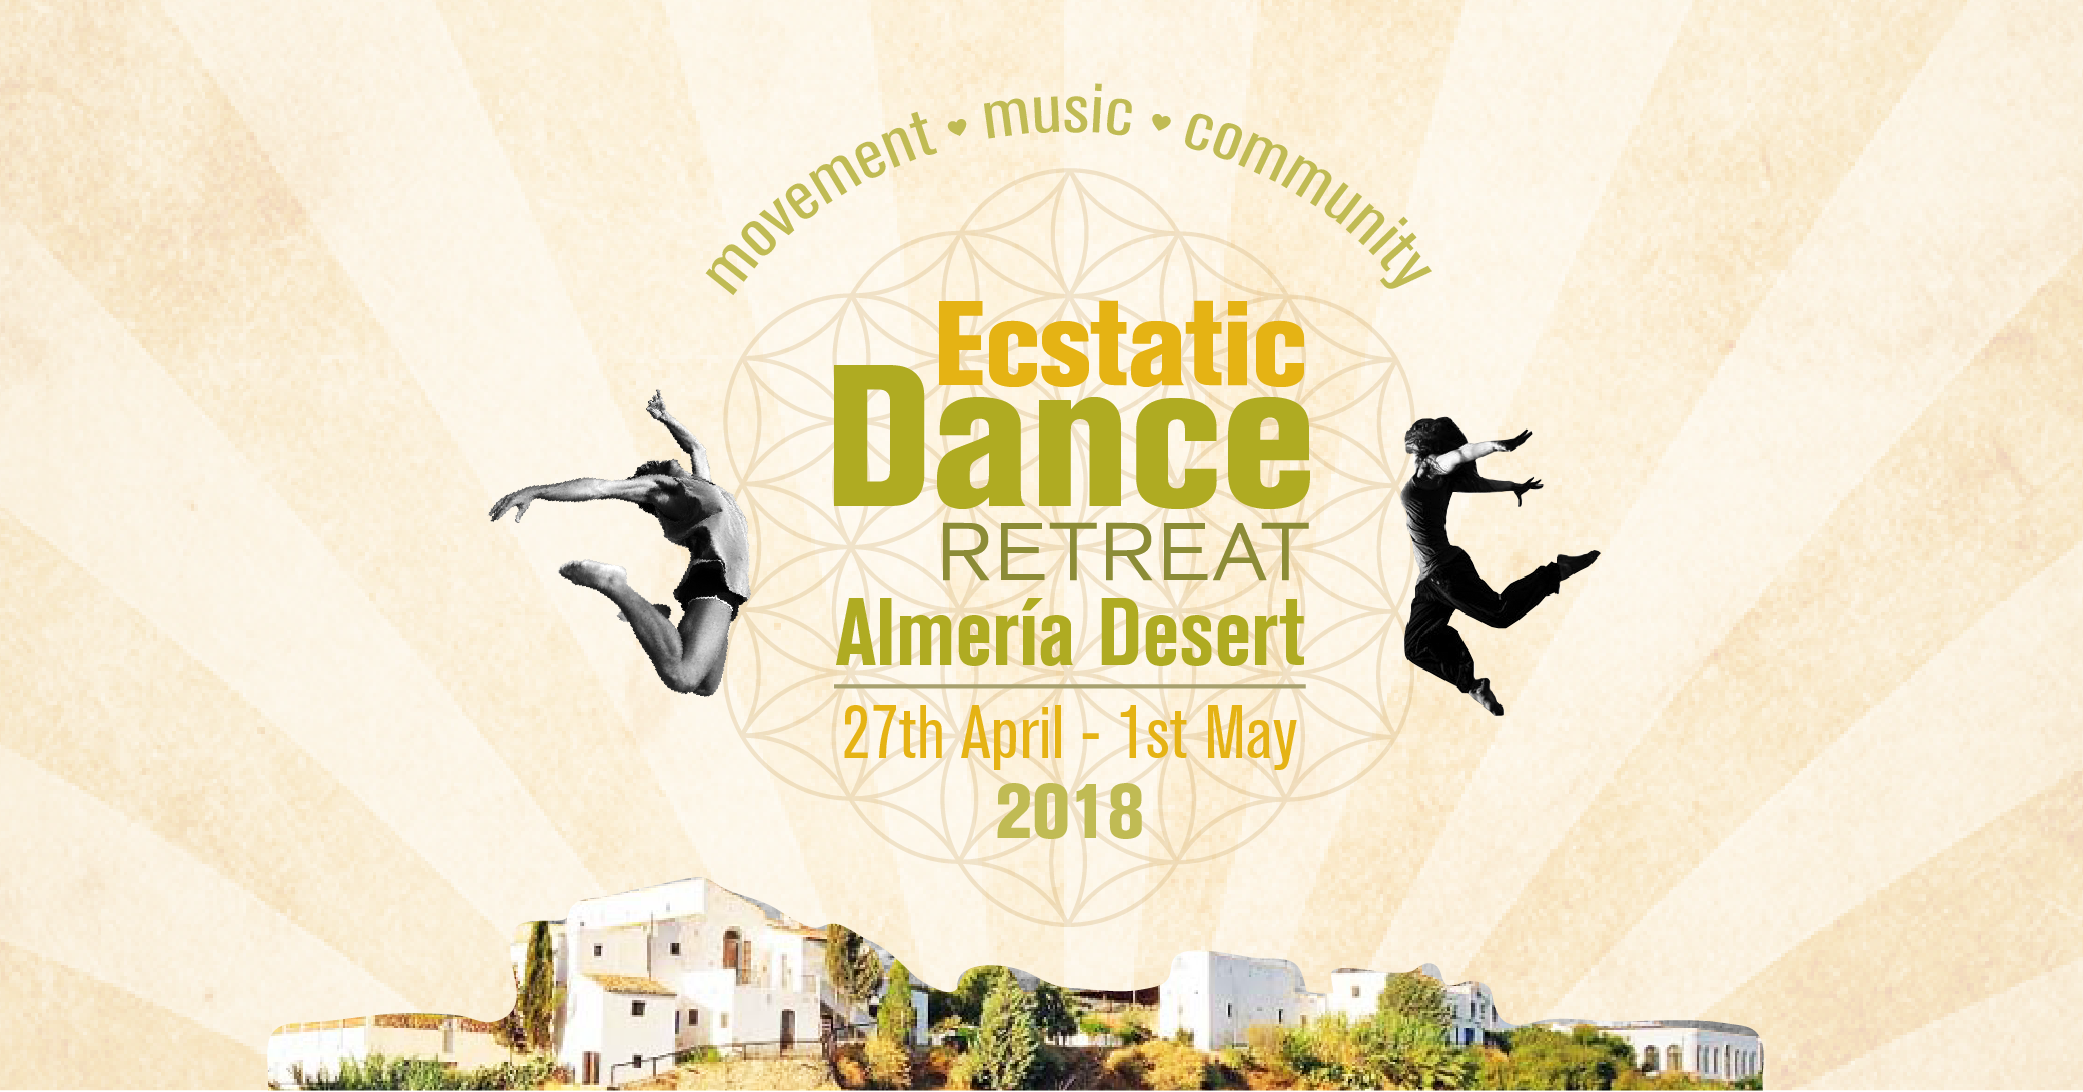 ECSTATIC DANCE RETREAT ALMERIA 2019